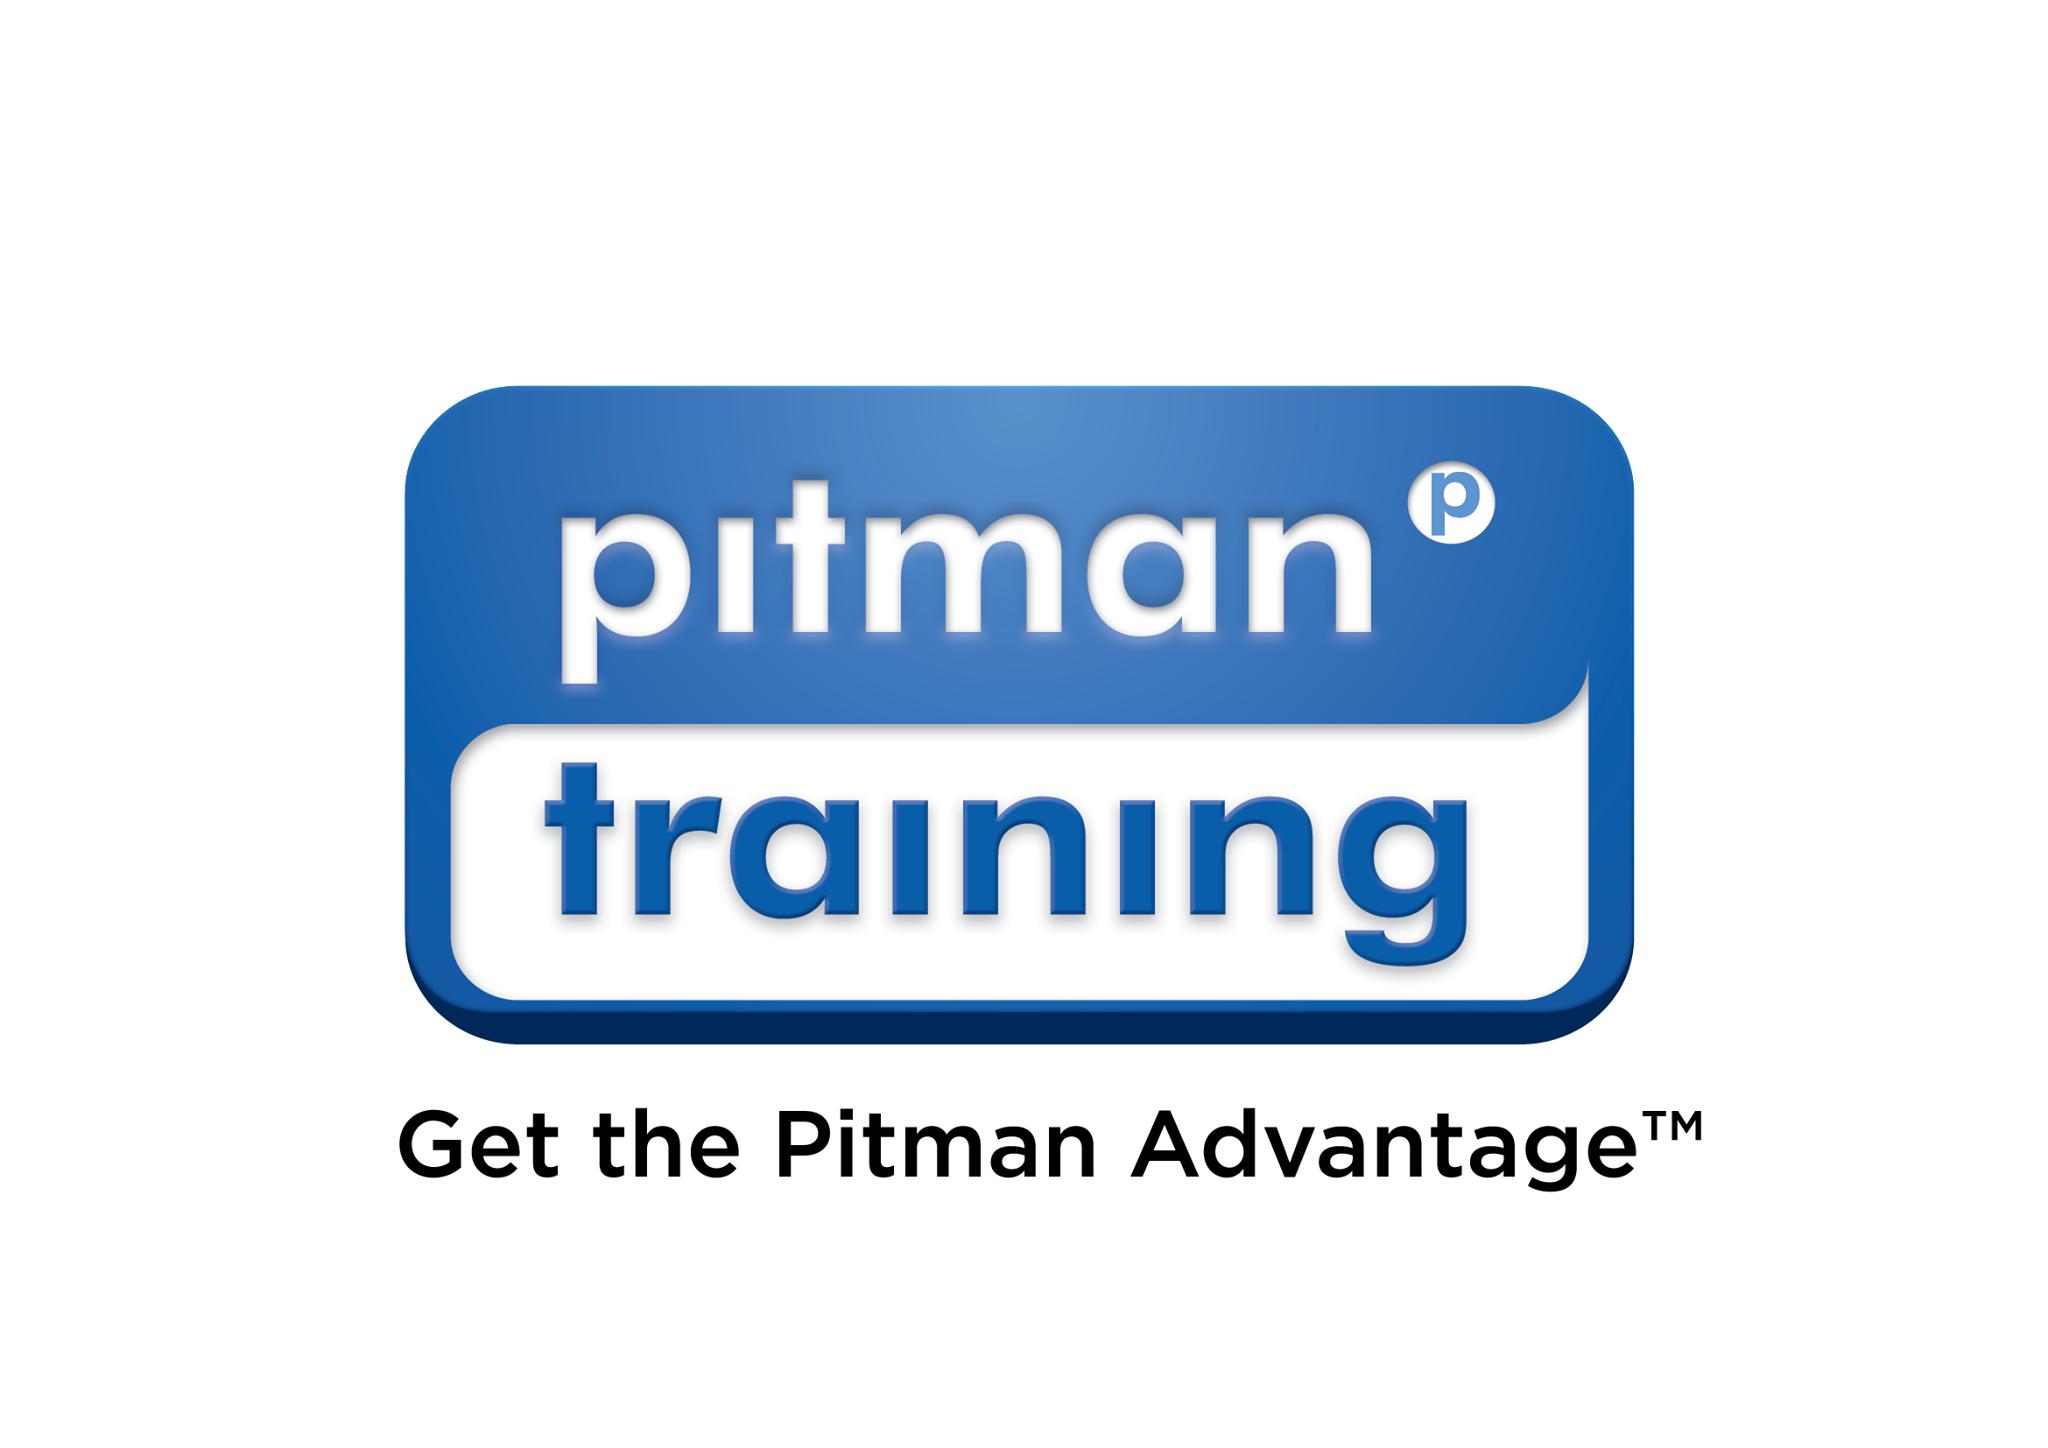 Pitman Training Barcelona